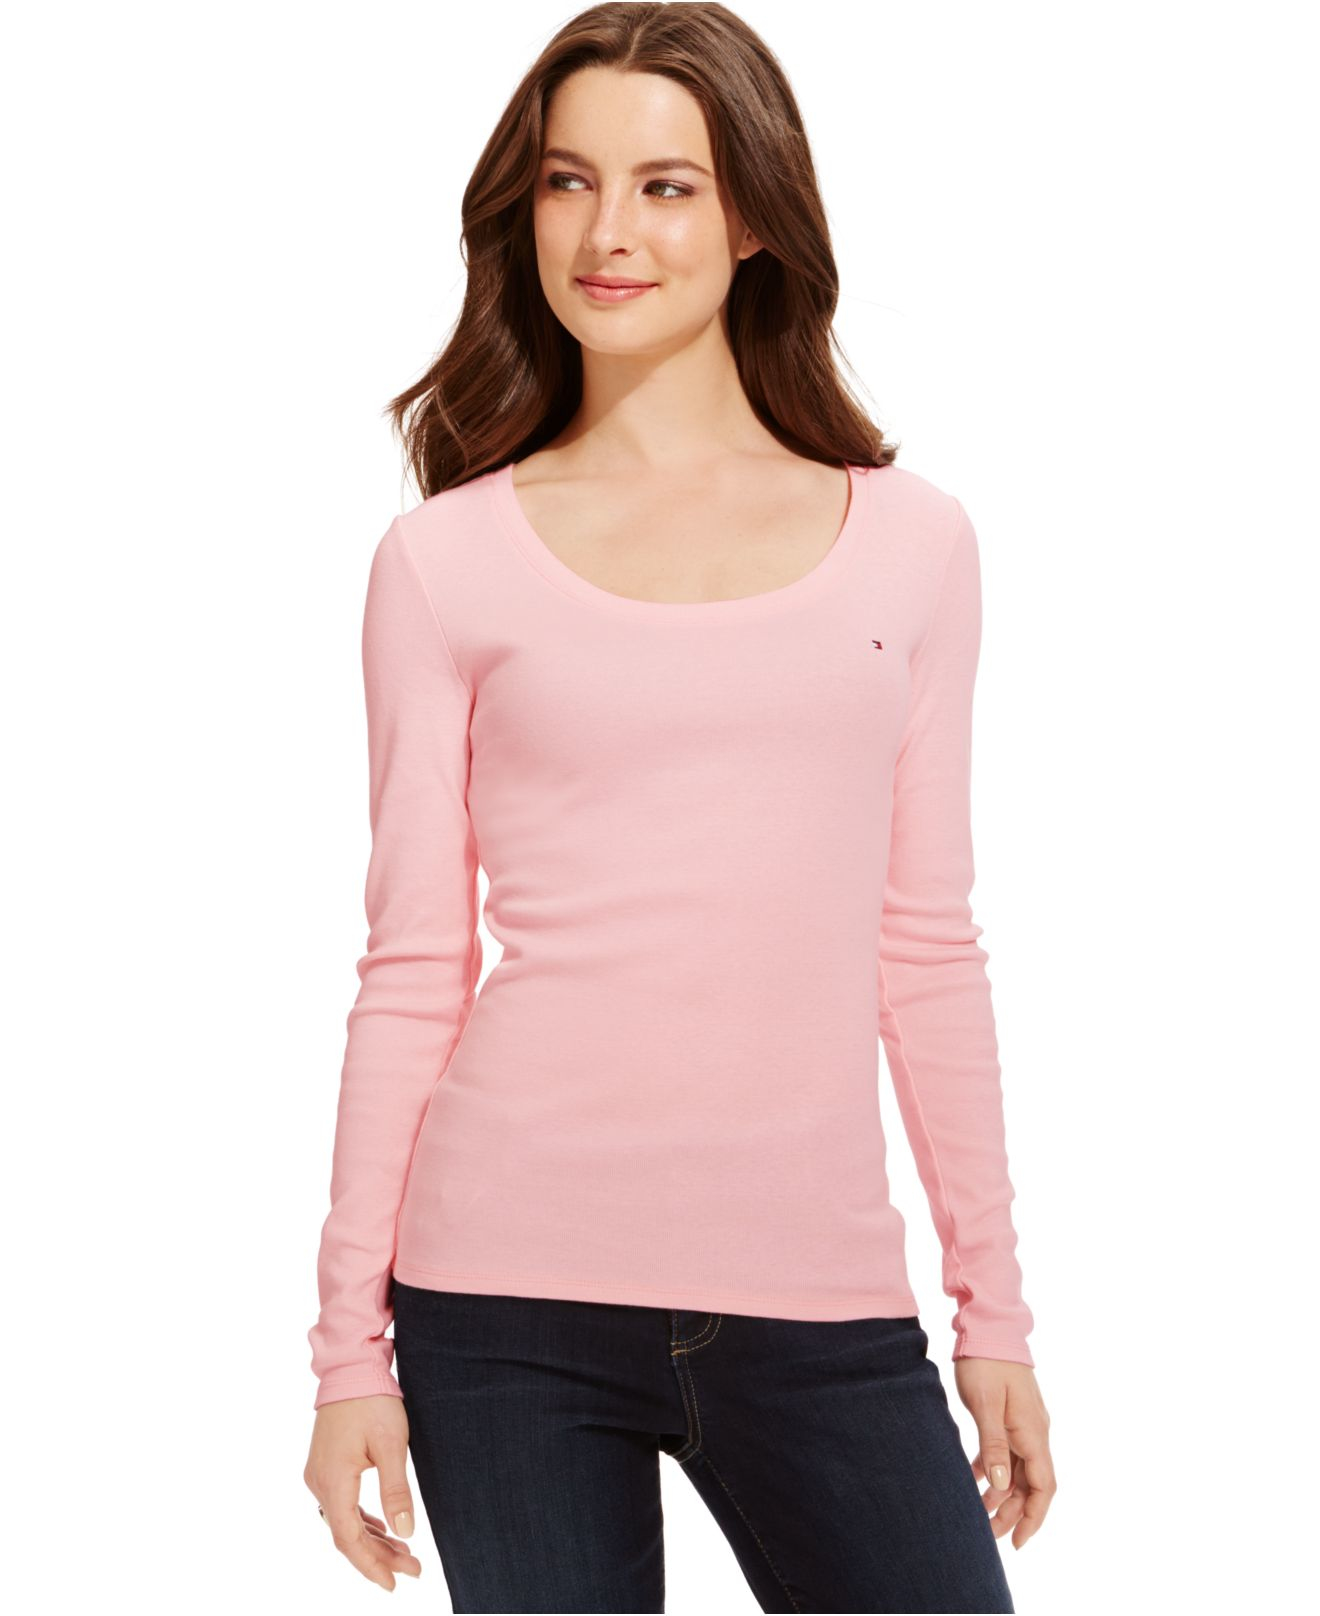 tommy hilfiger solid long sleeve tee in pink ballerina. Black Bedroom Furniture Sets. Home Design Ideas